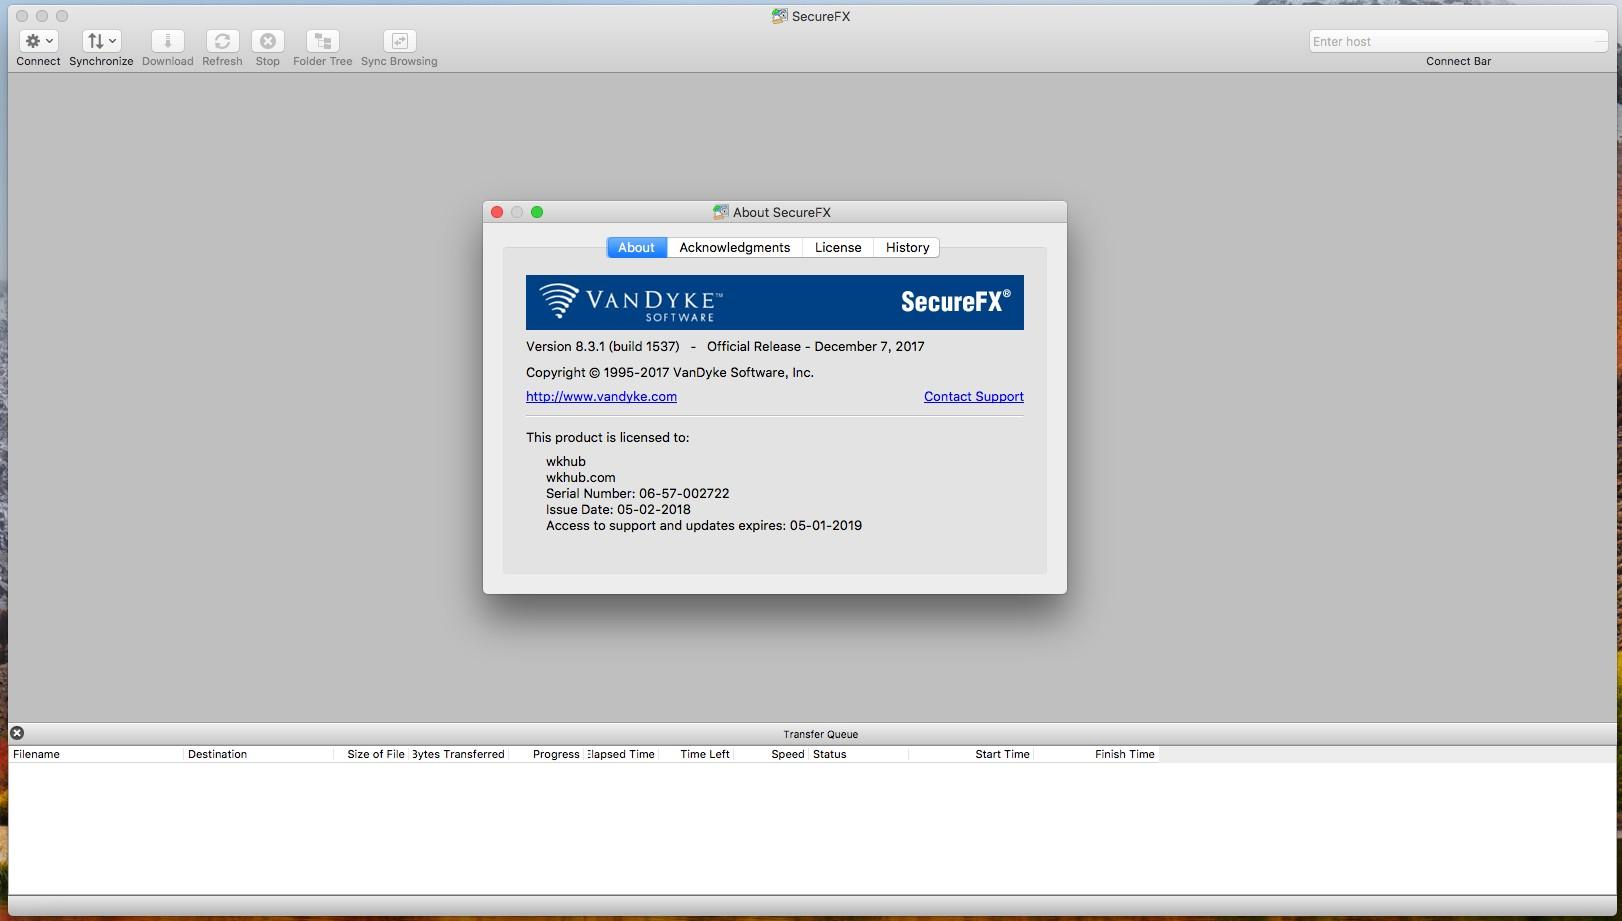 SecureFX 8.5.2 易于使用的多协议传输工具